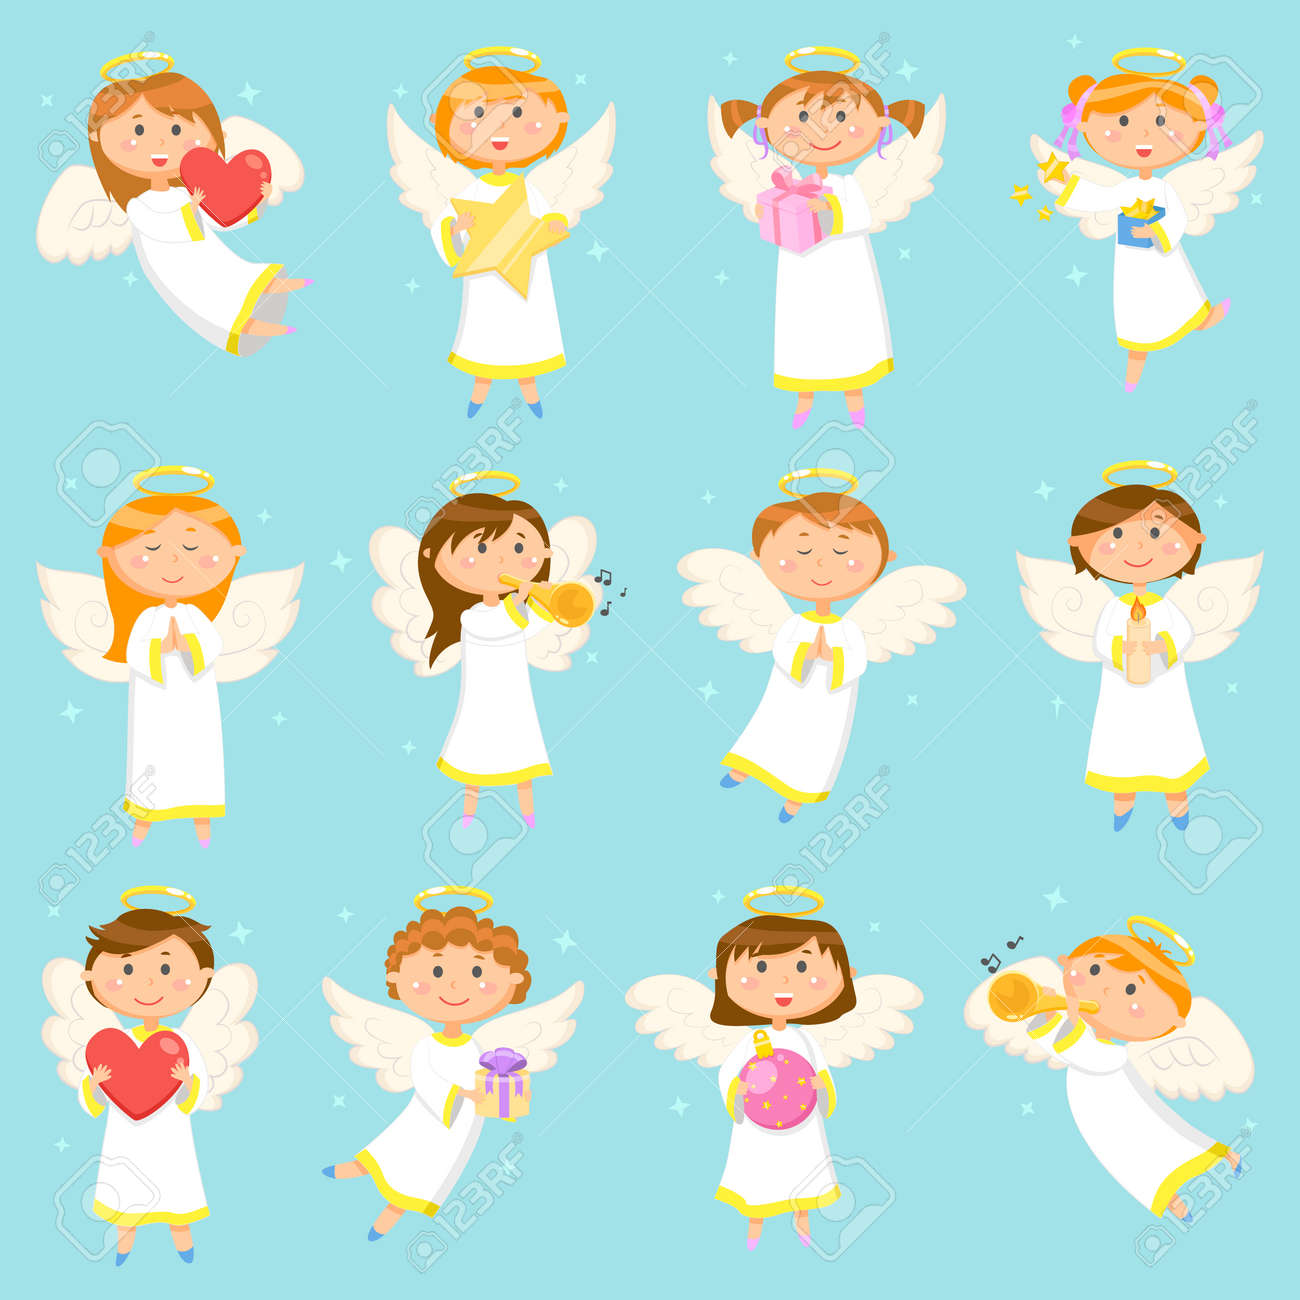 Angel Children, Boys and Girls Winter Holiday - 113721274